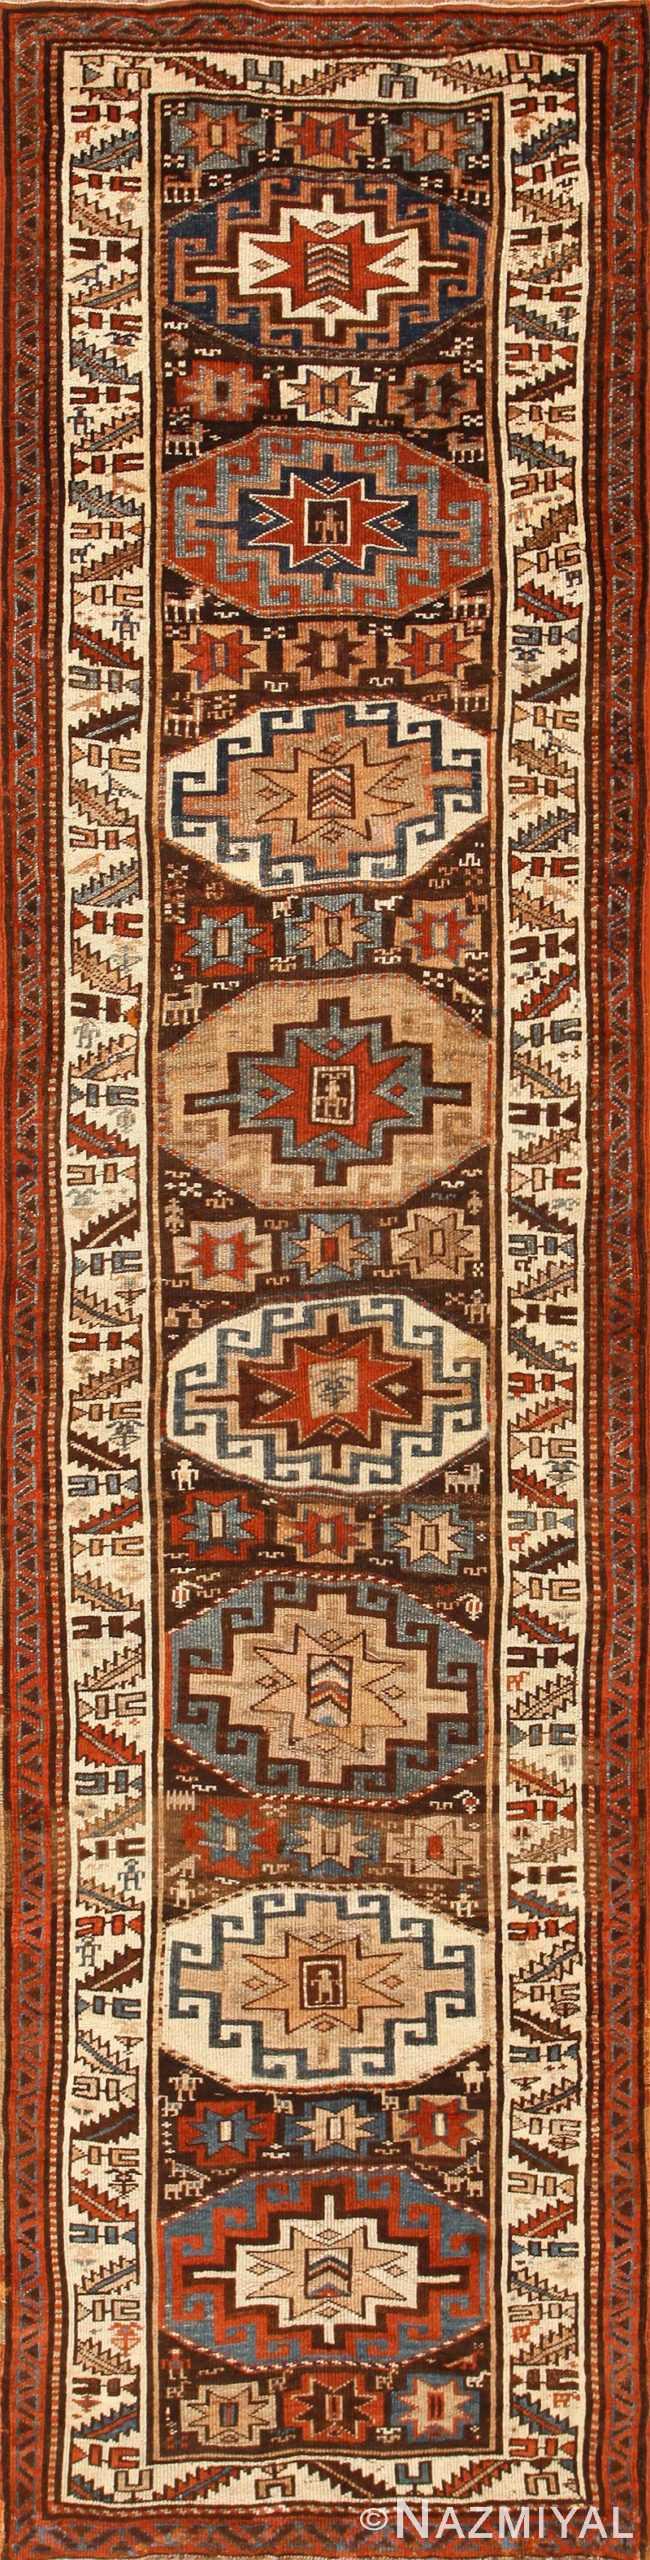 Tribal Antique Persian Kurdish Runner Rug 50463 Nazmiyal